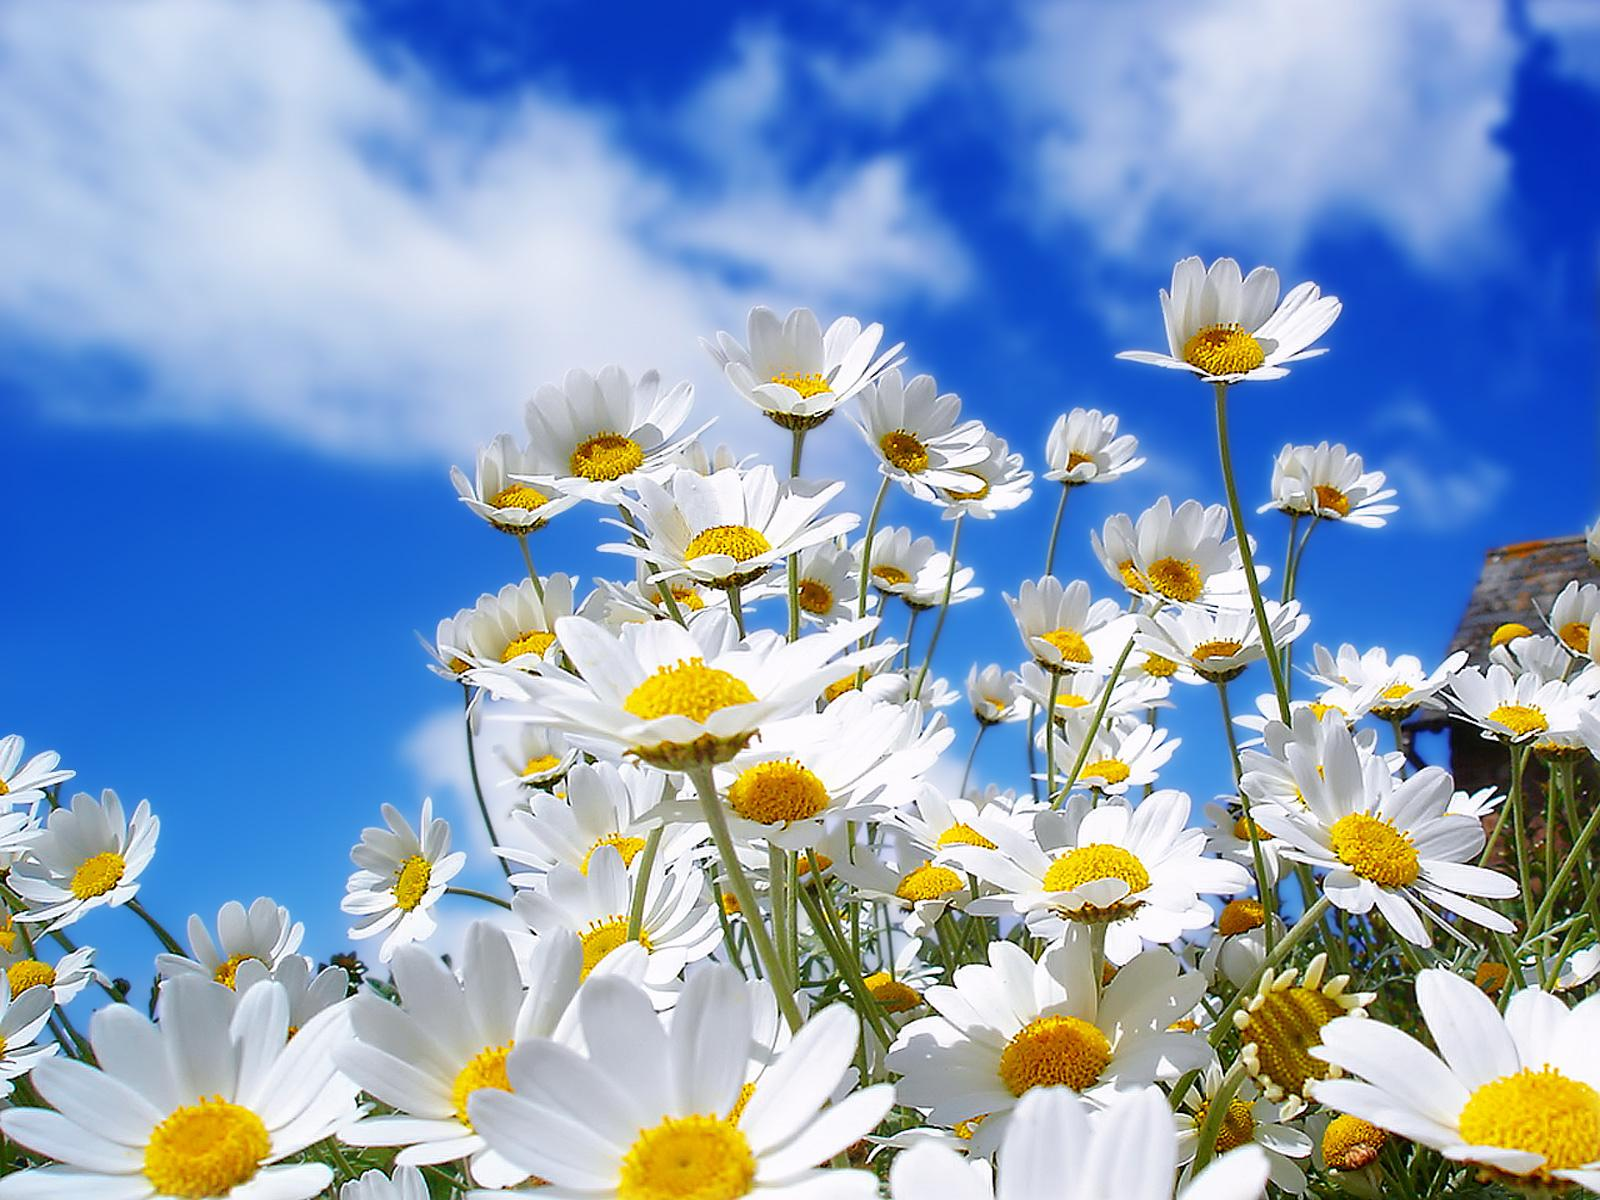 http://4.bp.blogspot.com/-H-JagnnDFag/TX1Uvs0qL0I/AAAAAAAAFqI/4ld1pQpWyxU/s1600/daisies.jpg